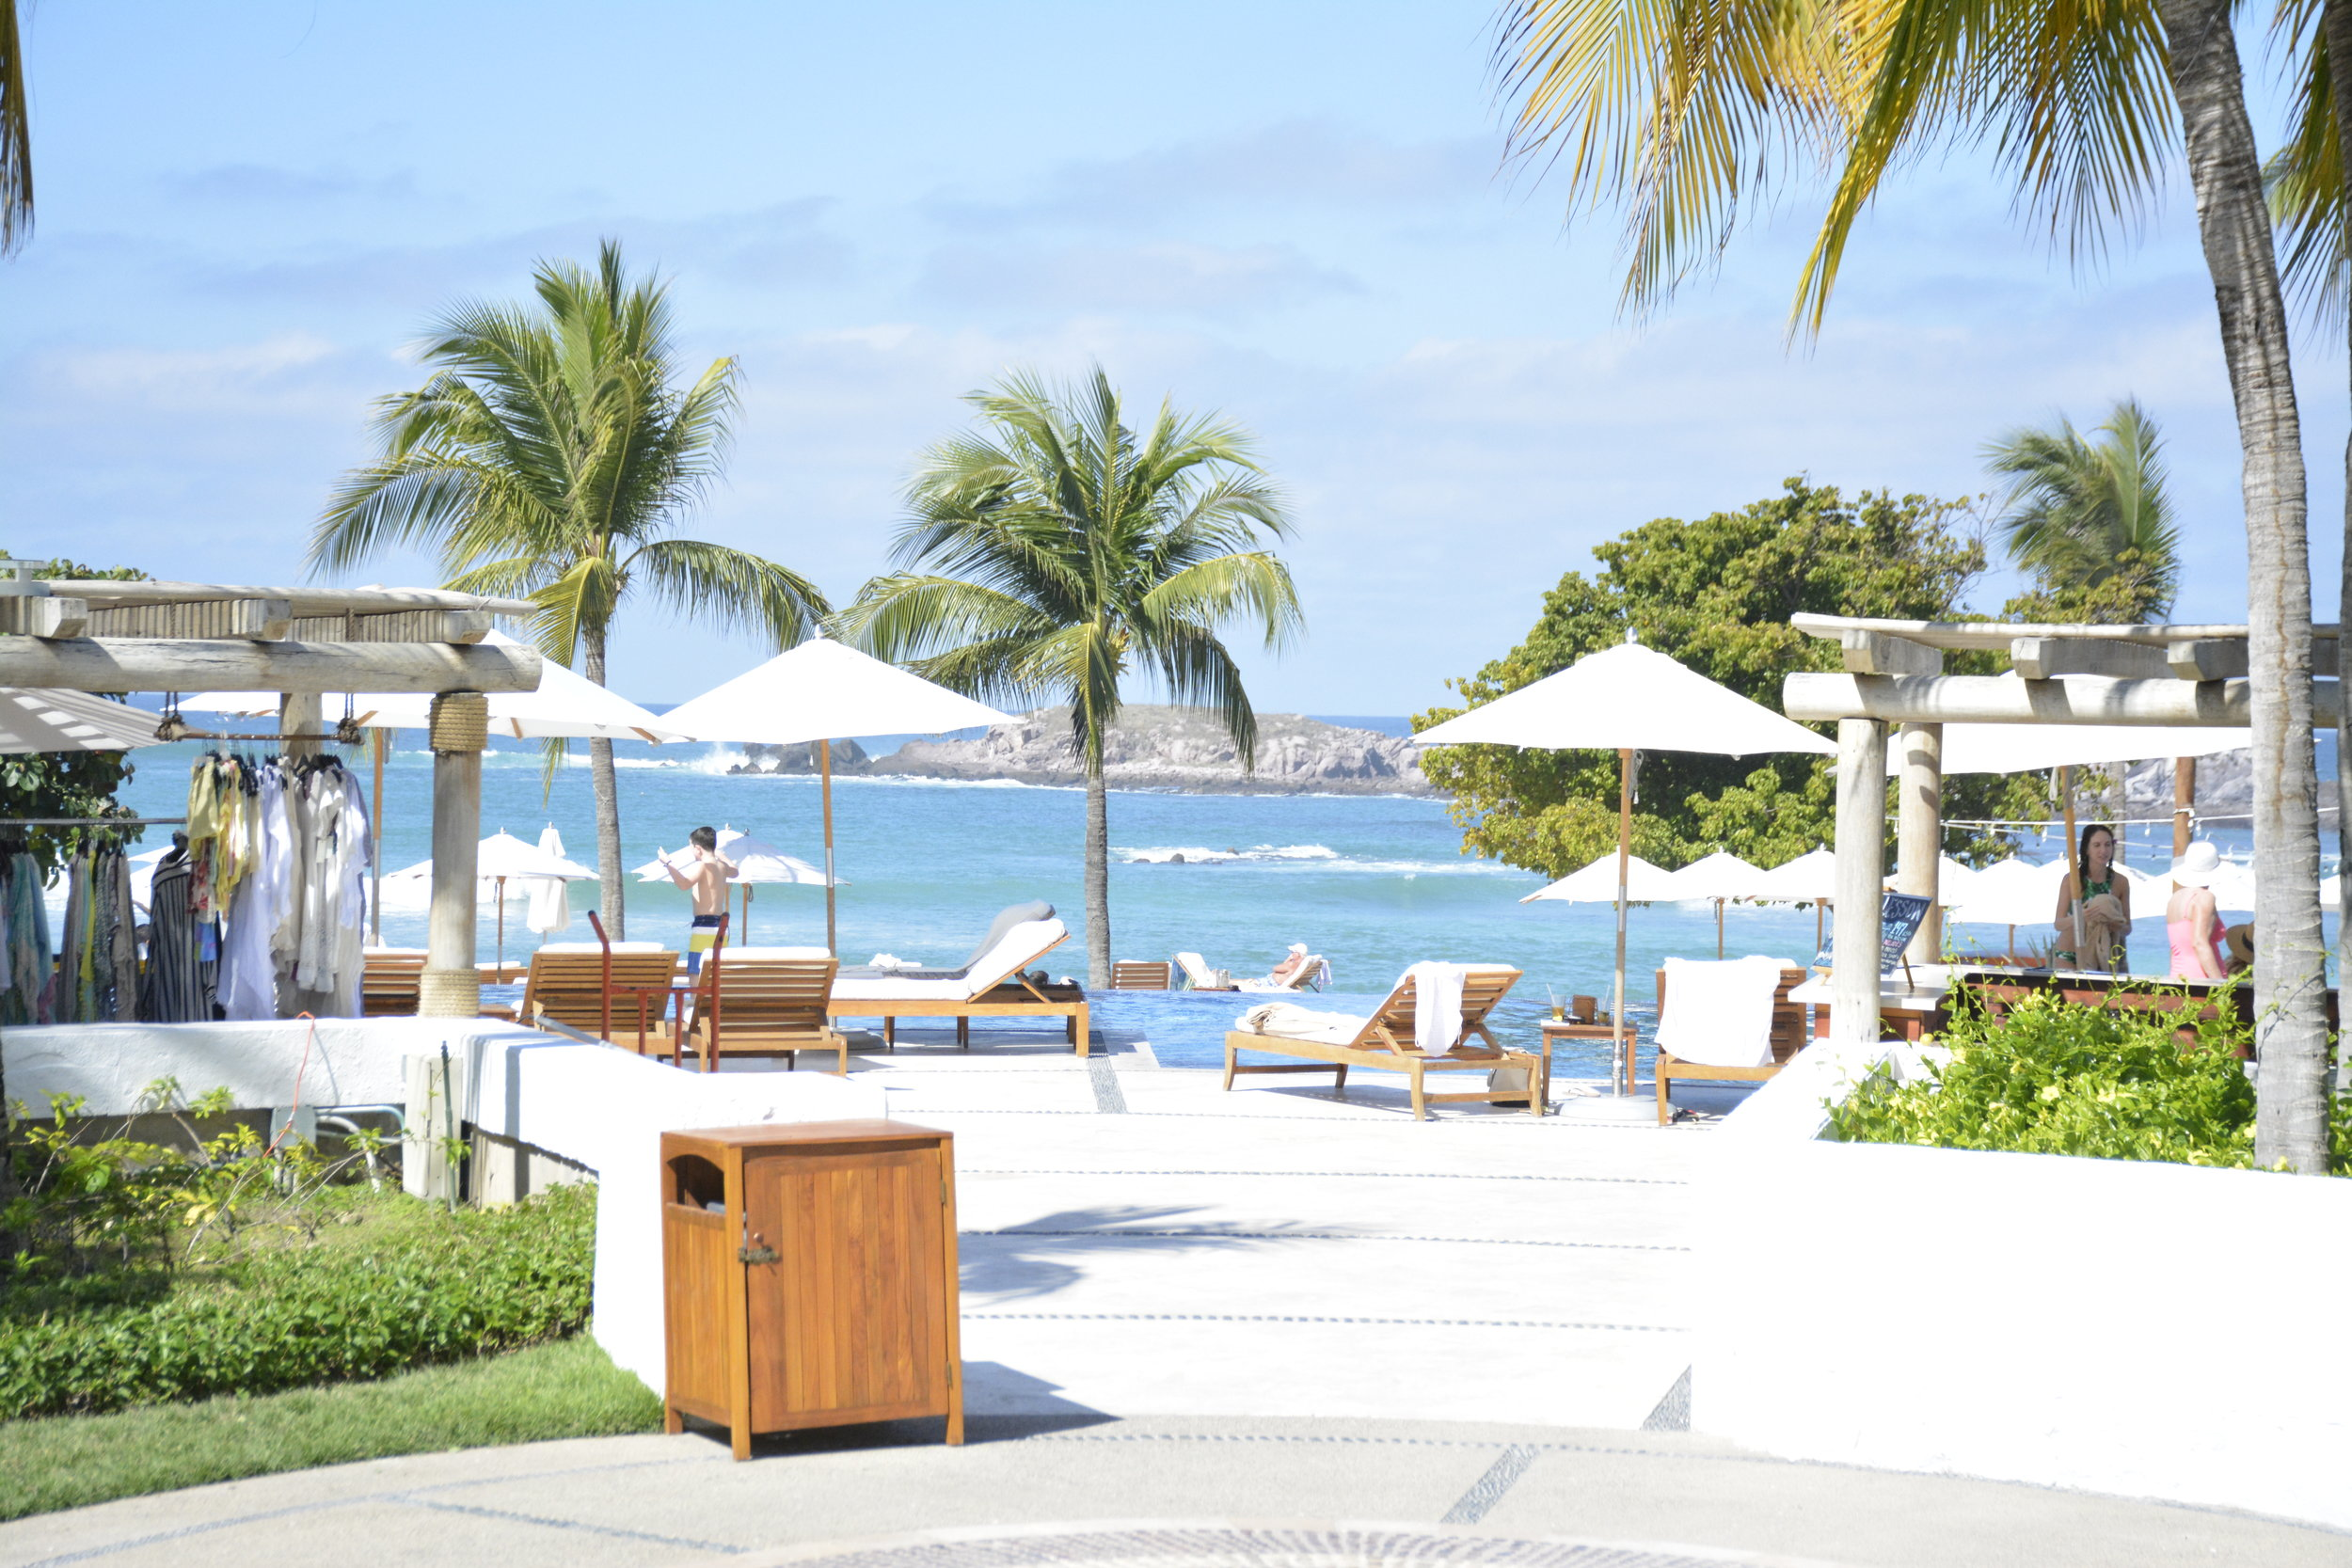 St. Regis Resort, Punta Mita